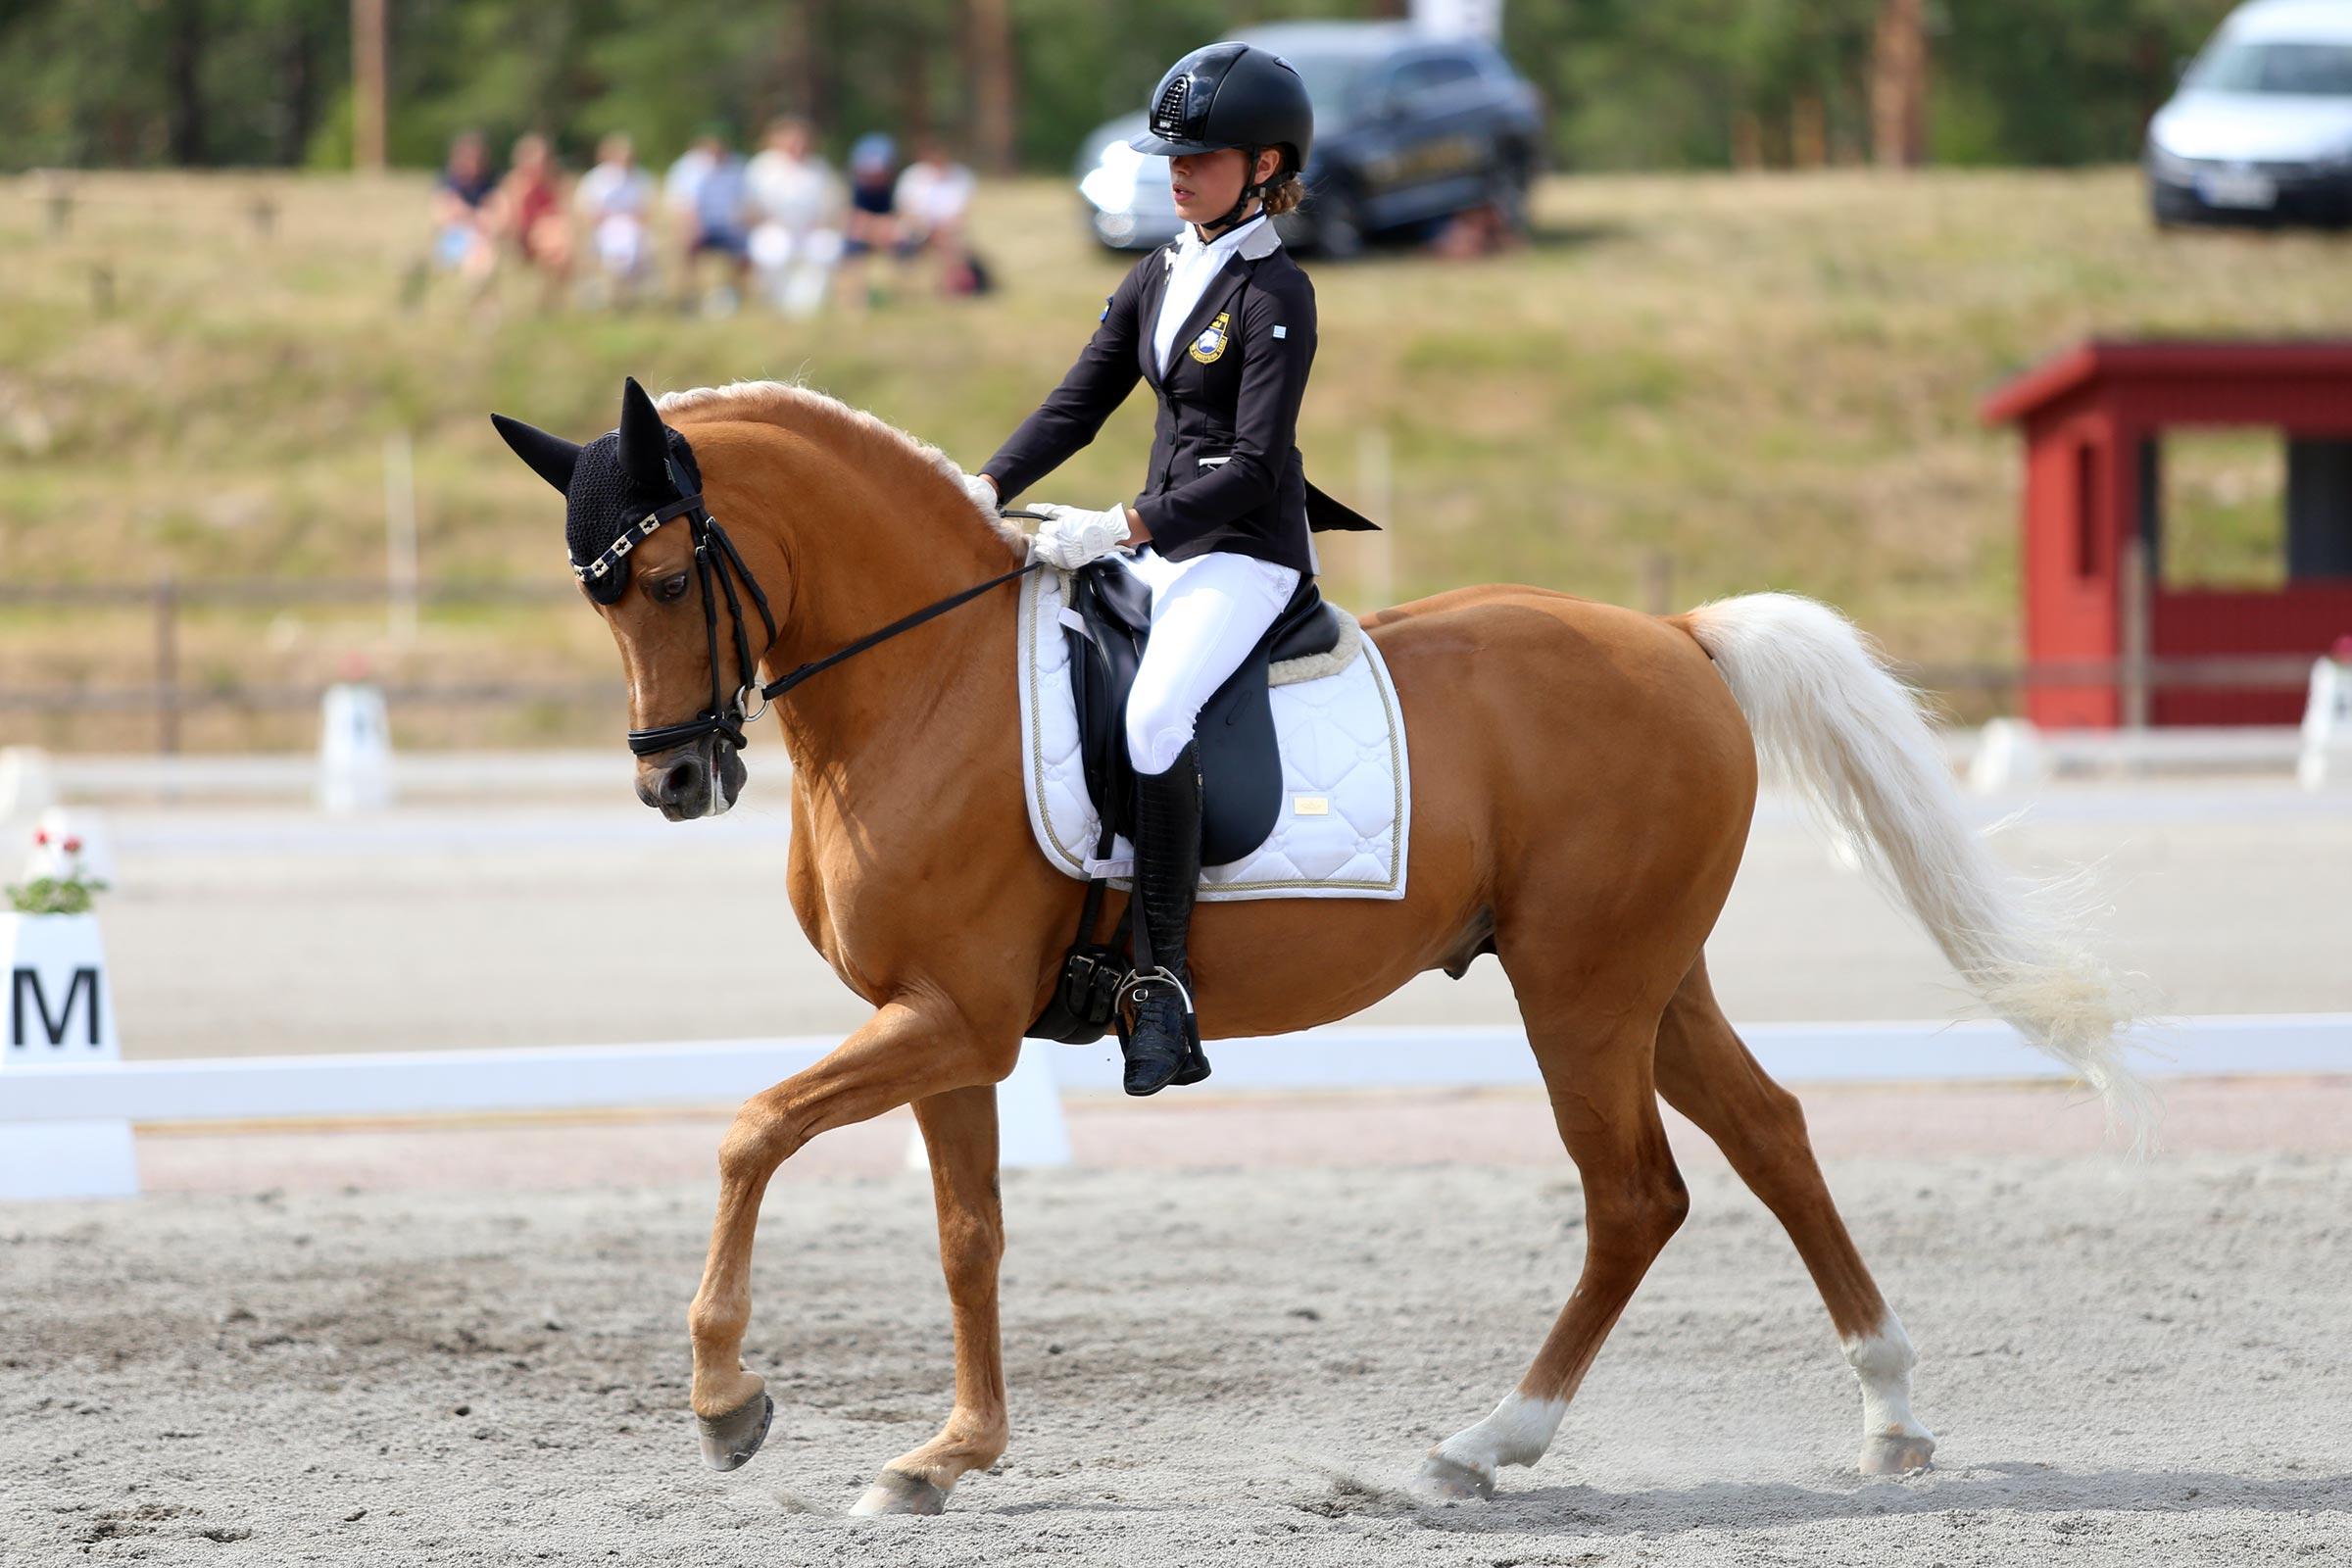 Brons: Emilia Berglund Bergåkra - Jarno RP 145 (ASRP hingst f-01 e Coelenhage's Purioso-Coelenhage's Let's Be the Best, uppf R. Bonhof)